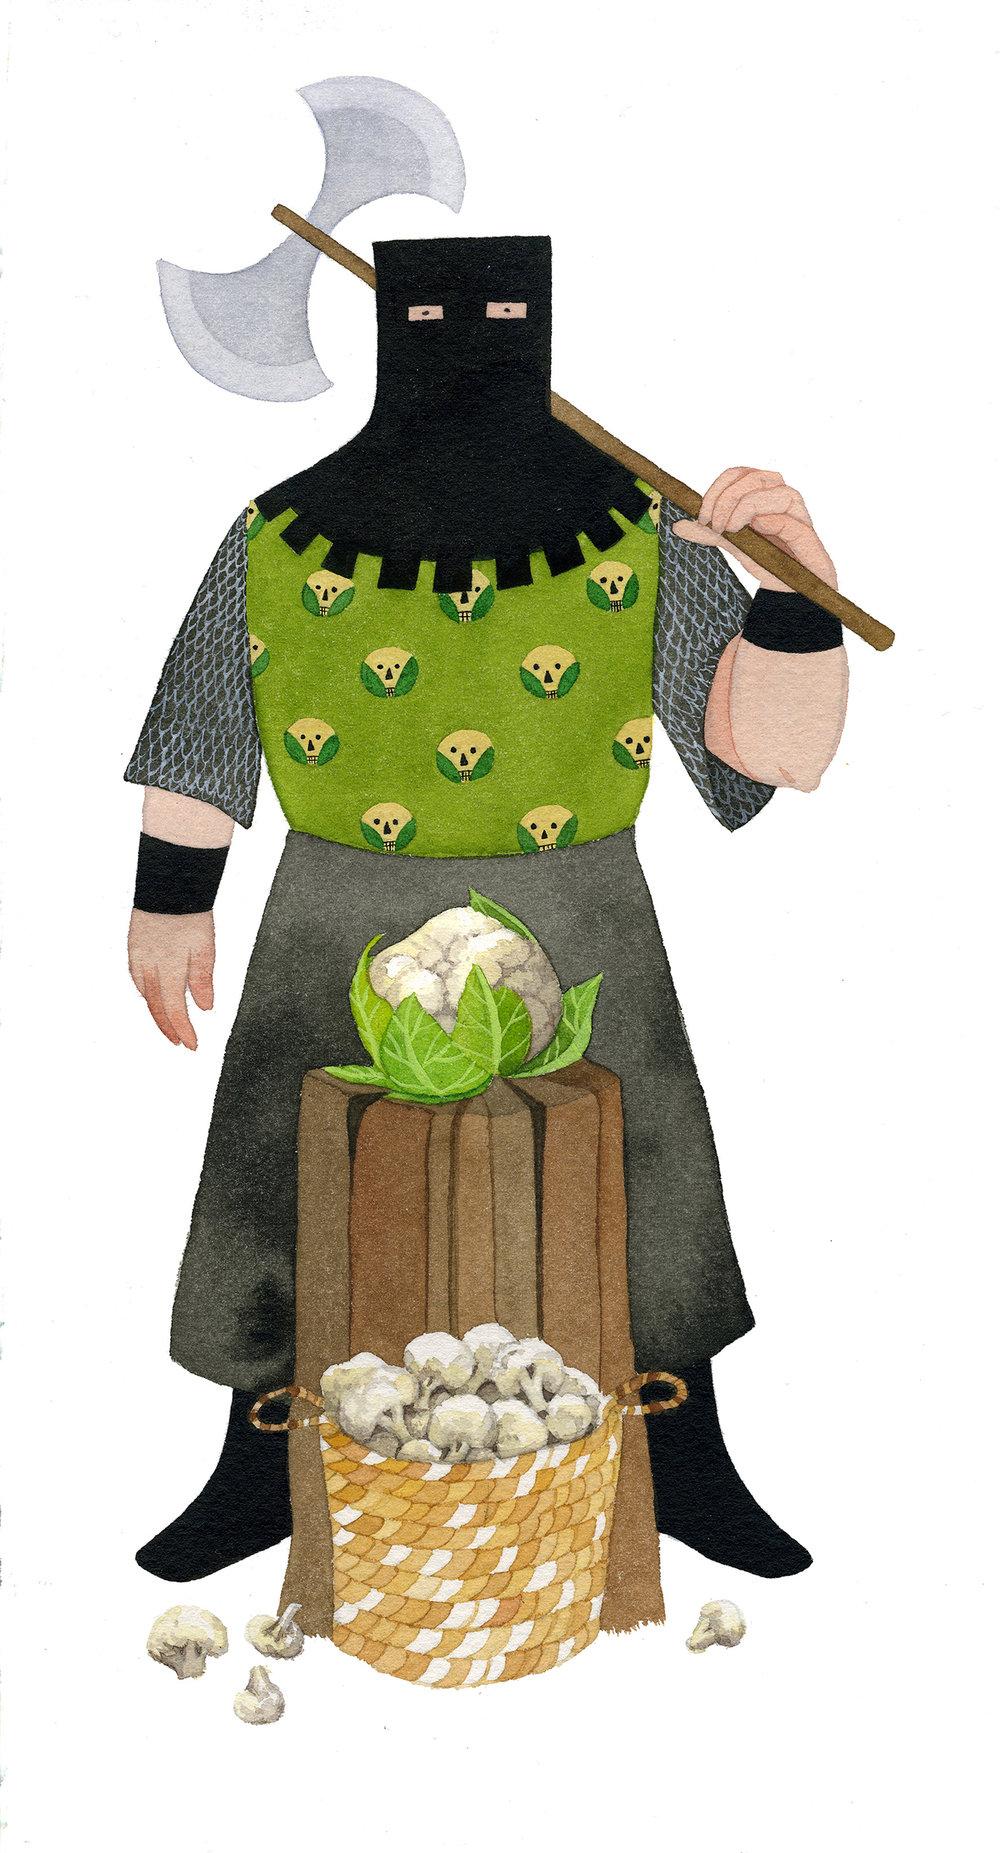 Cauliflower_mikaylabutchart.jpg